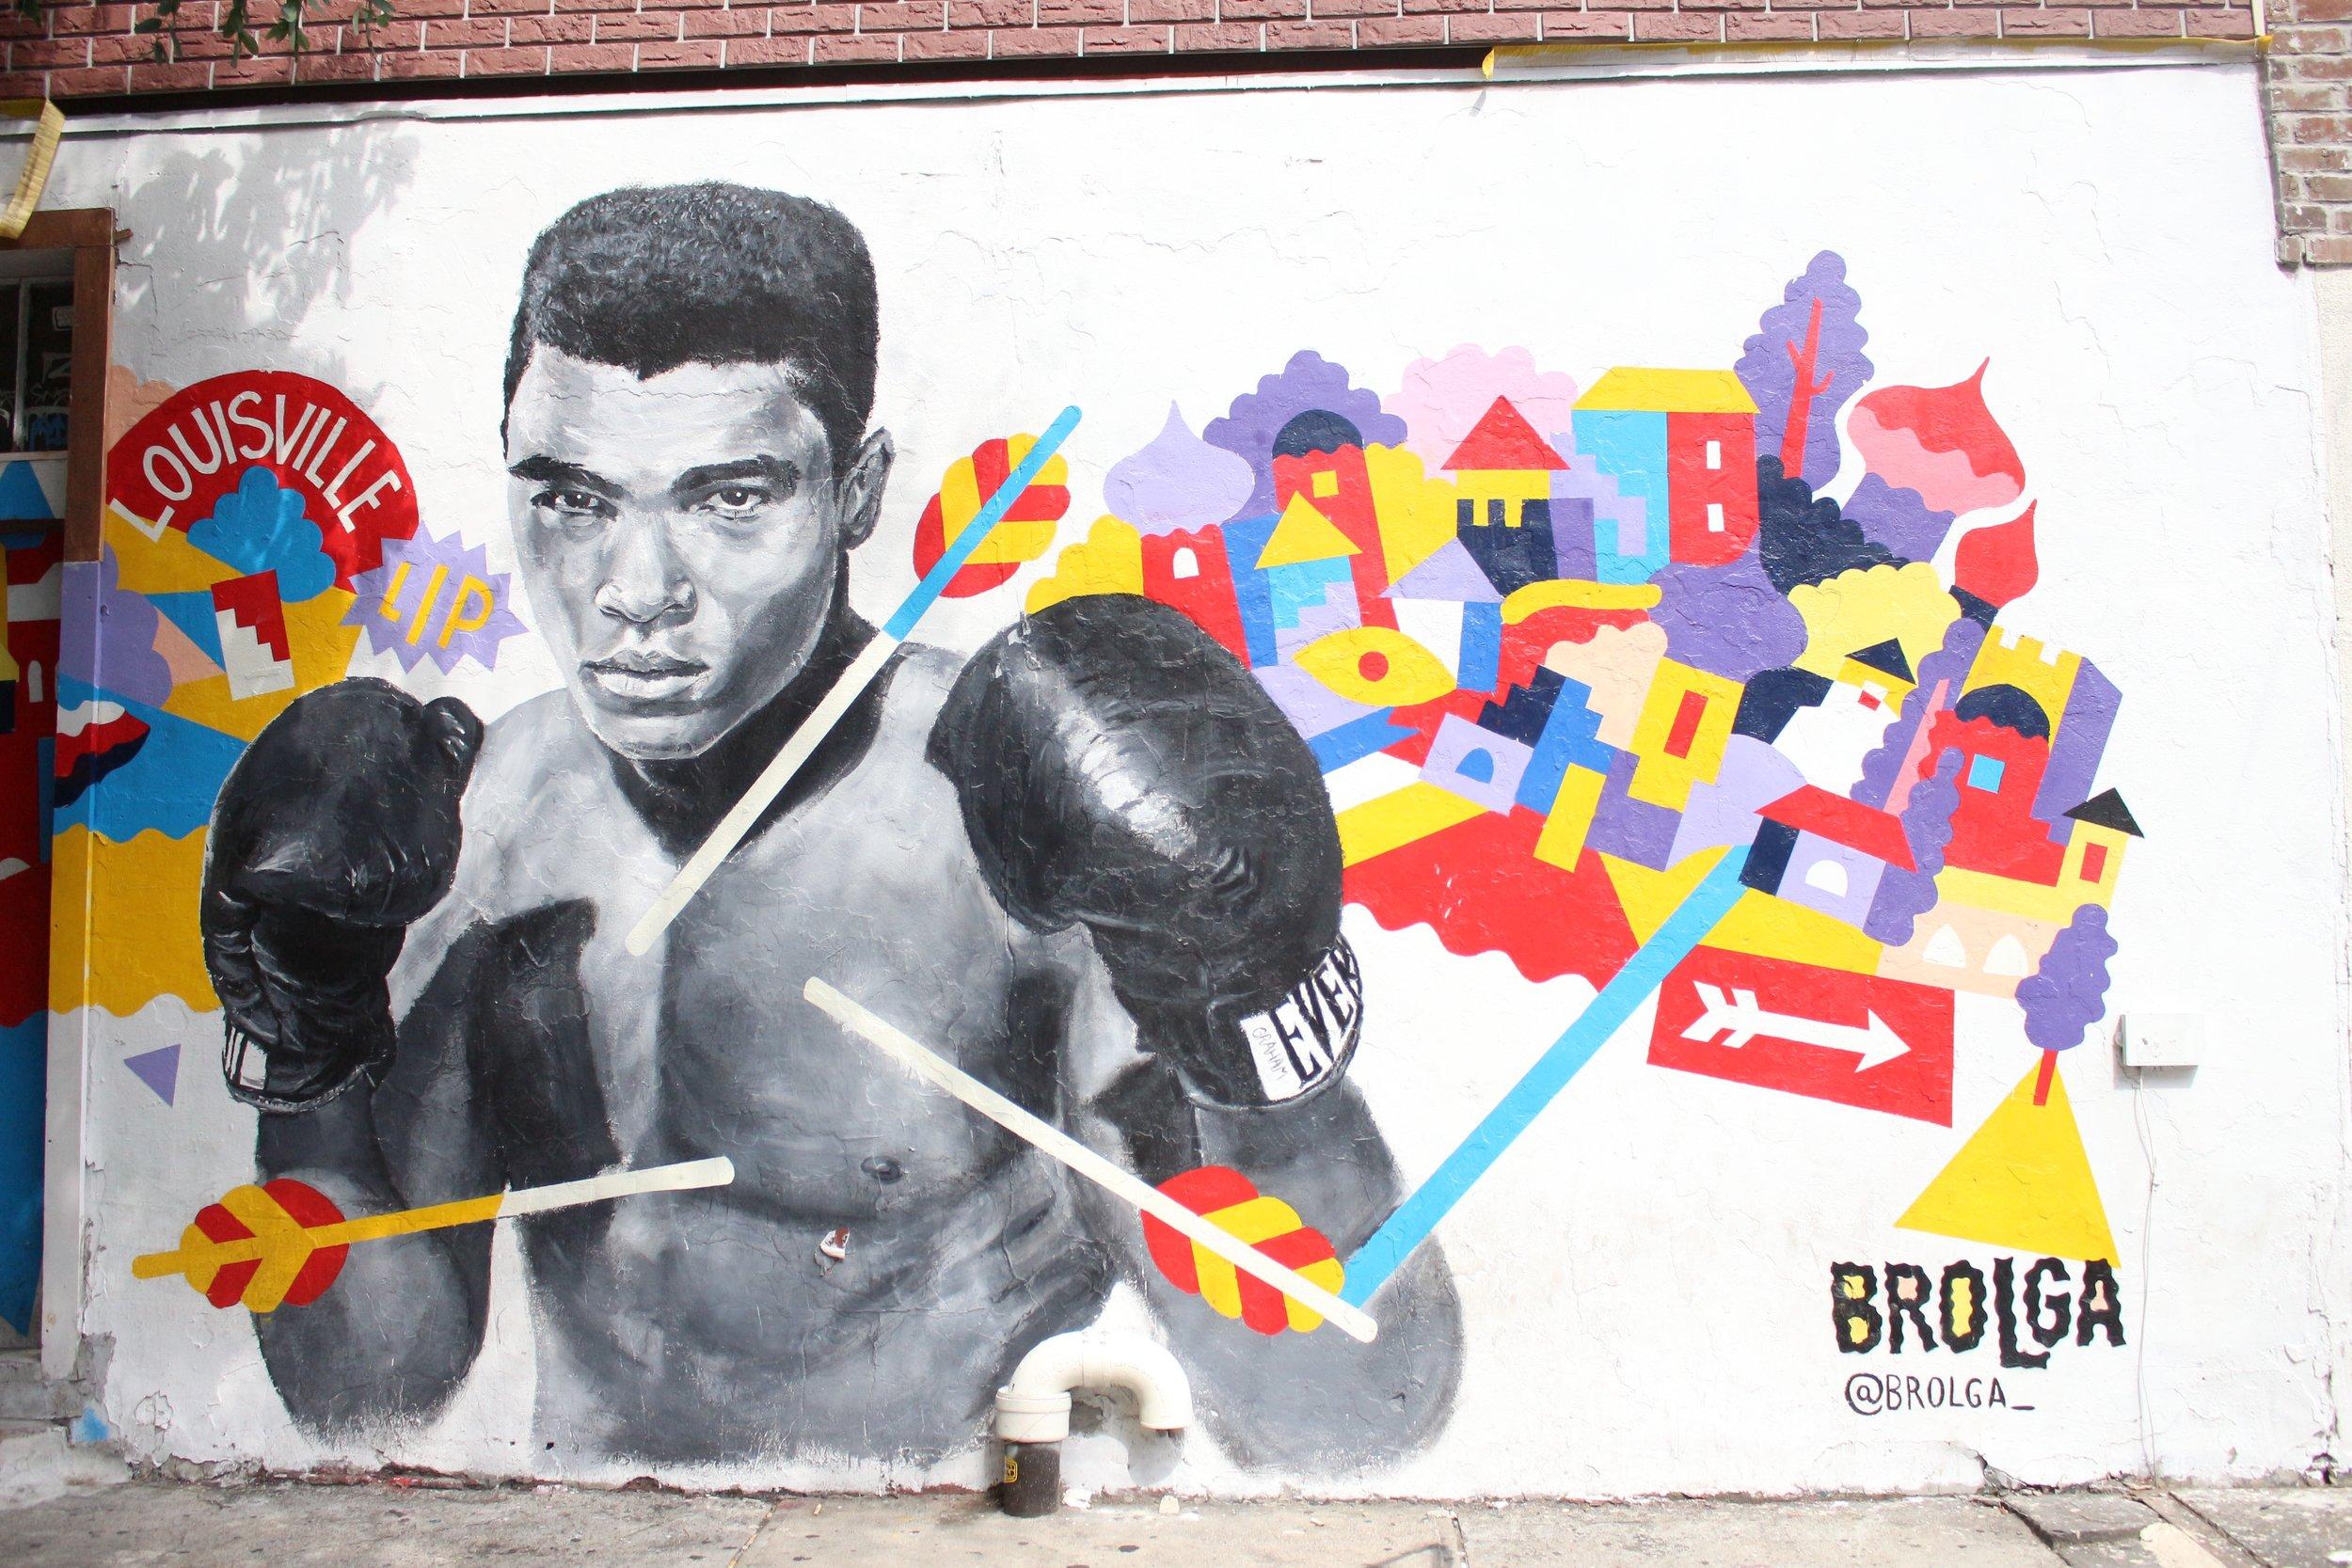 alii wall in brooklyn, NY with jasmine diane